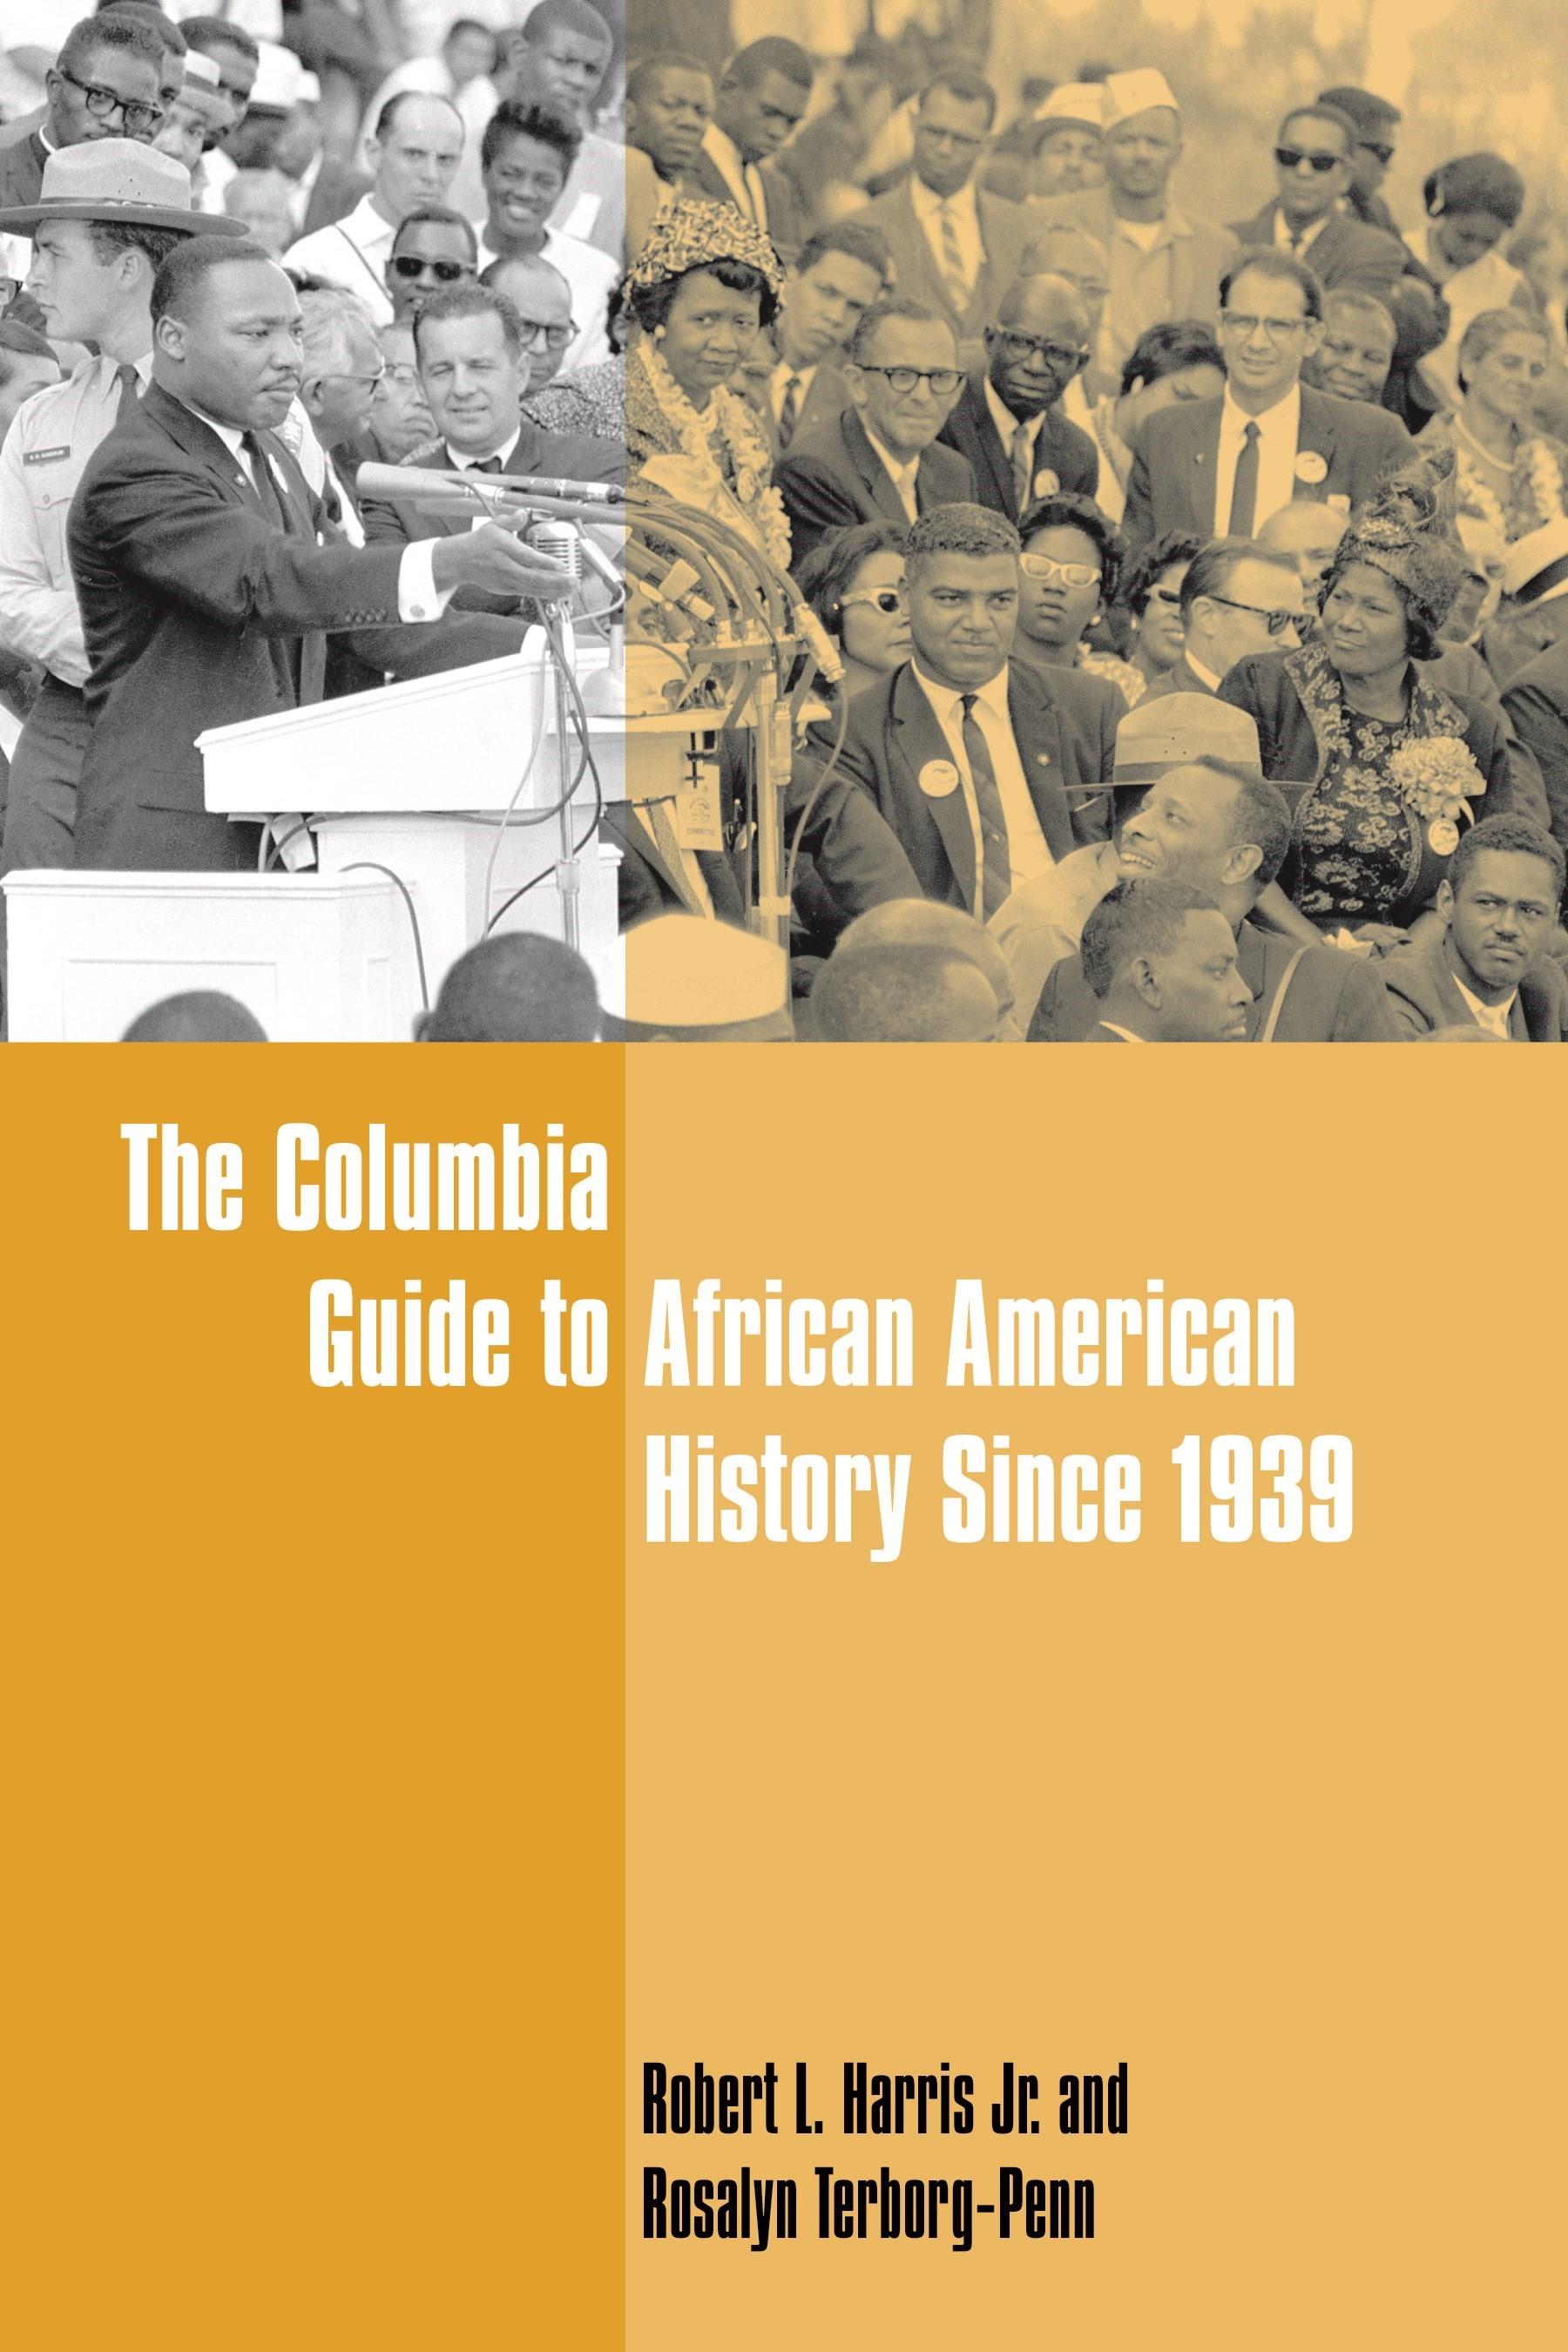 Abbildung von Harris Jr. / Terborg-Penn | The Columbia Guide to African American History Since 1939 | 2008